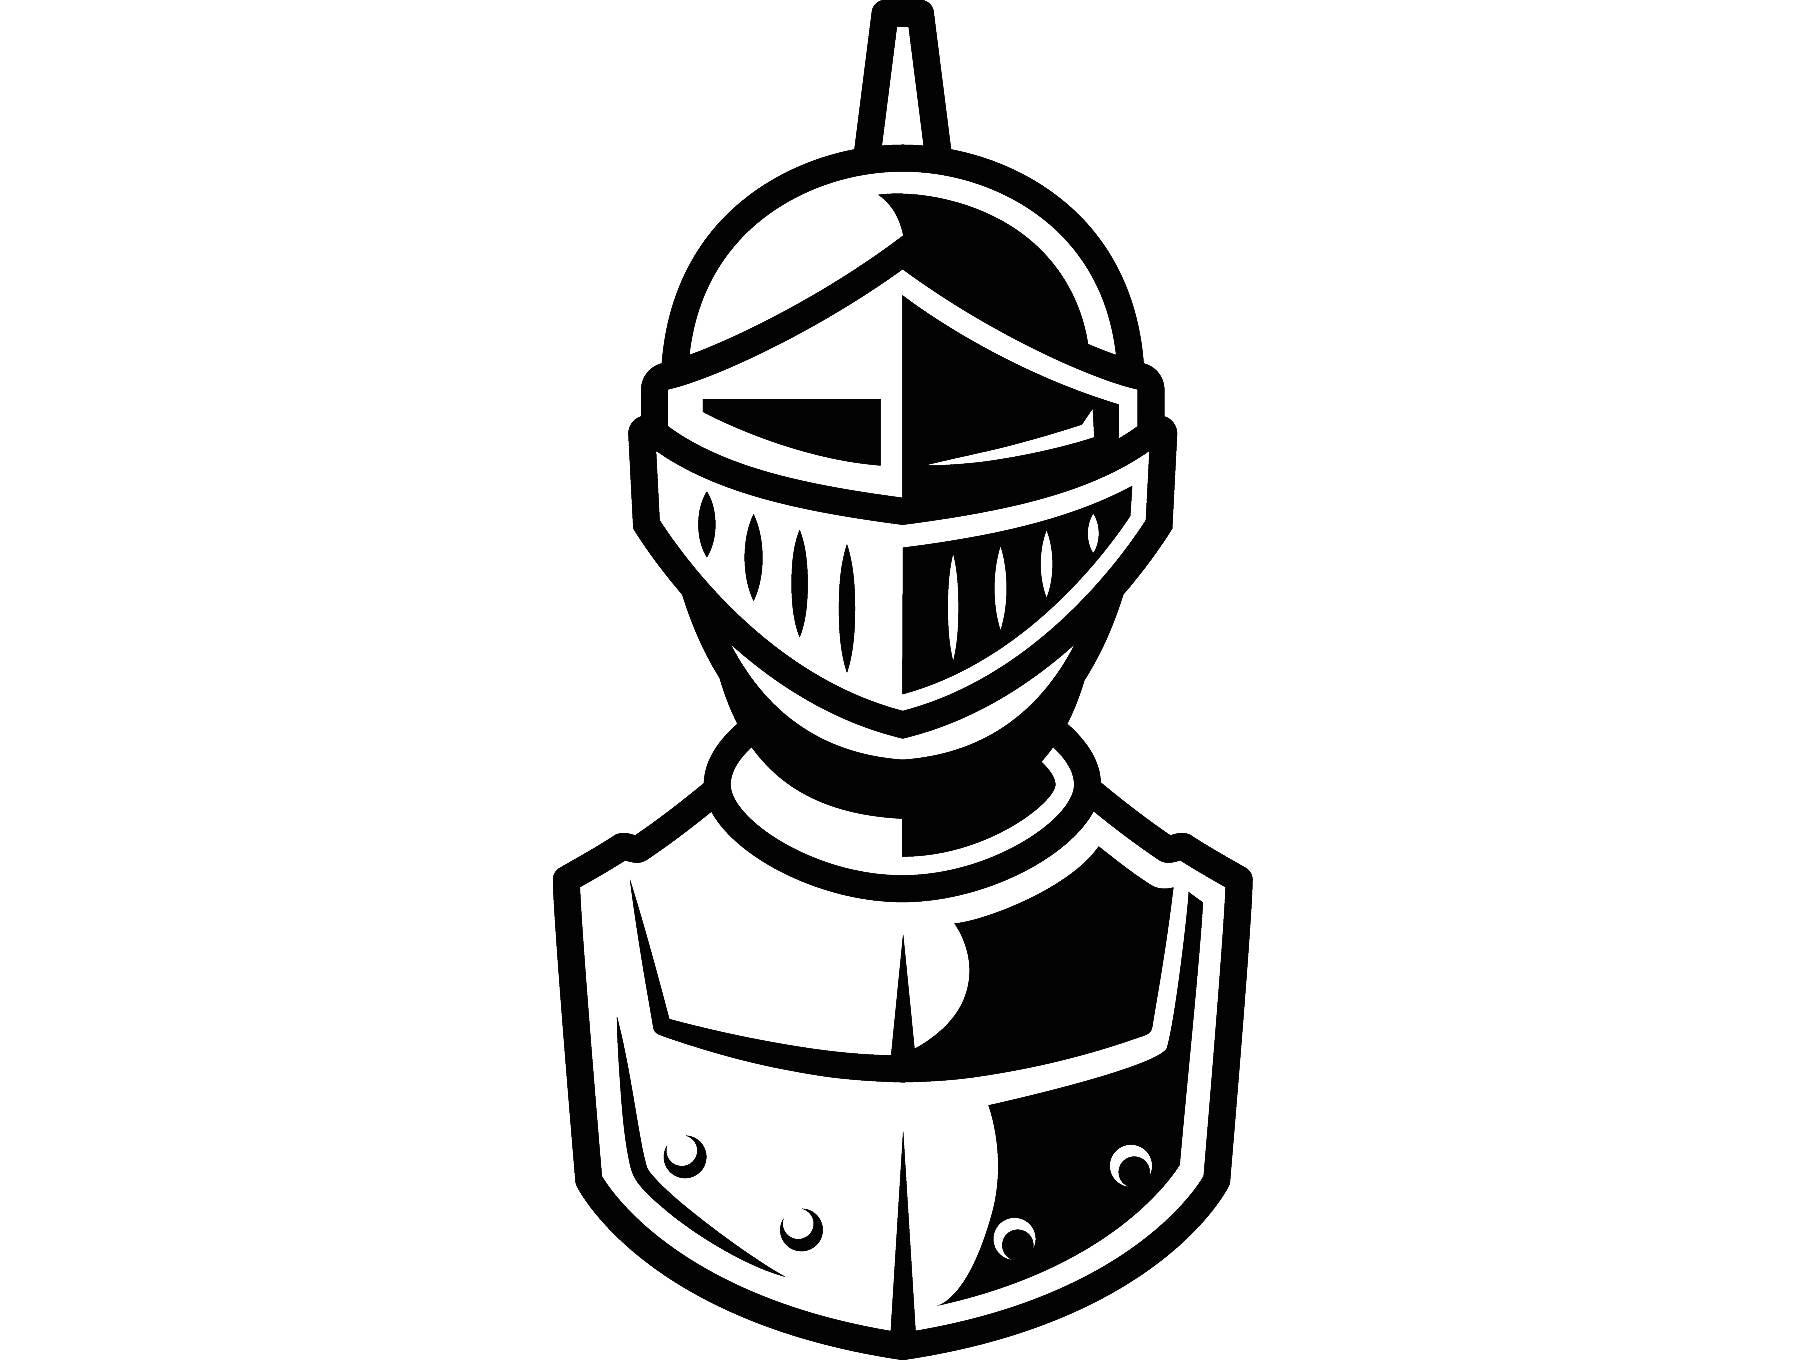 Knight 7 Metal Armor Helmet Sword Horse Monarch Military